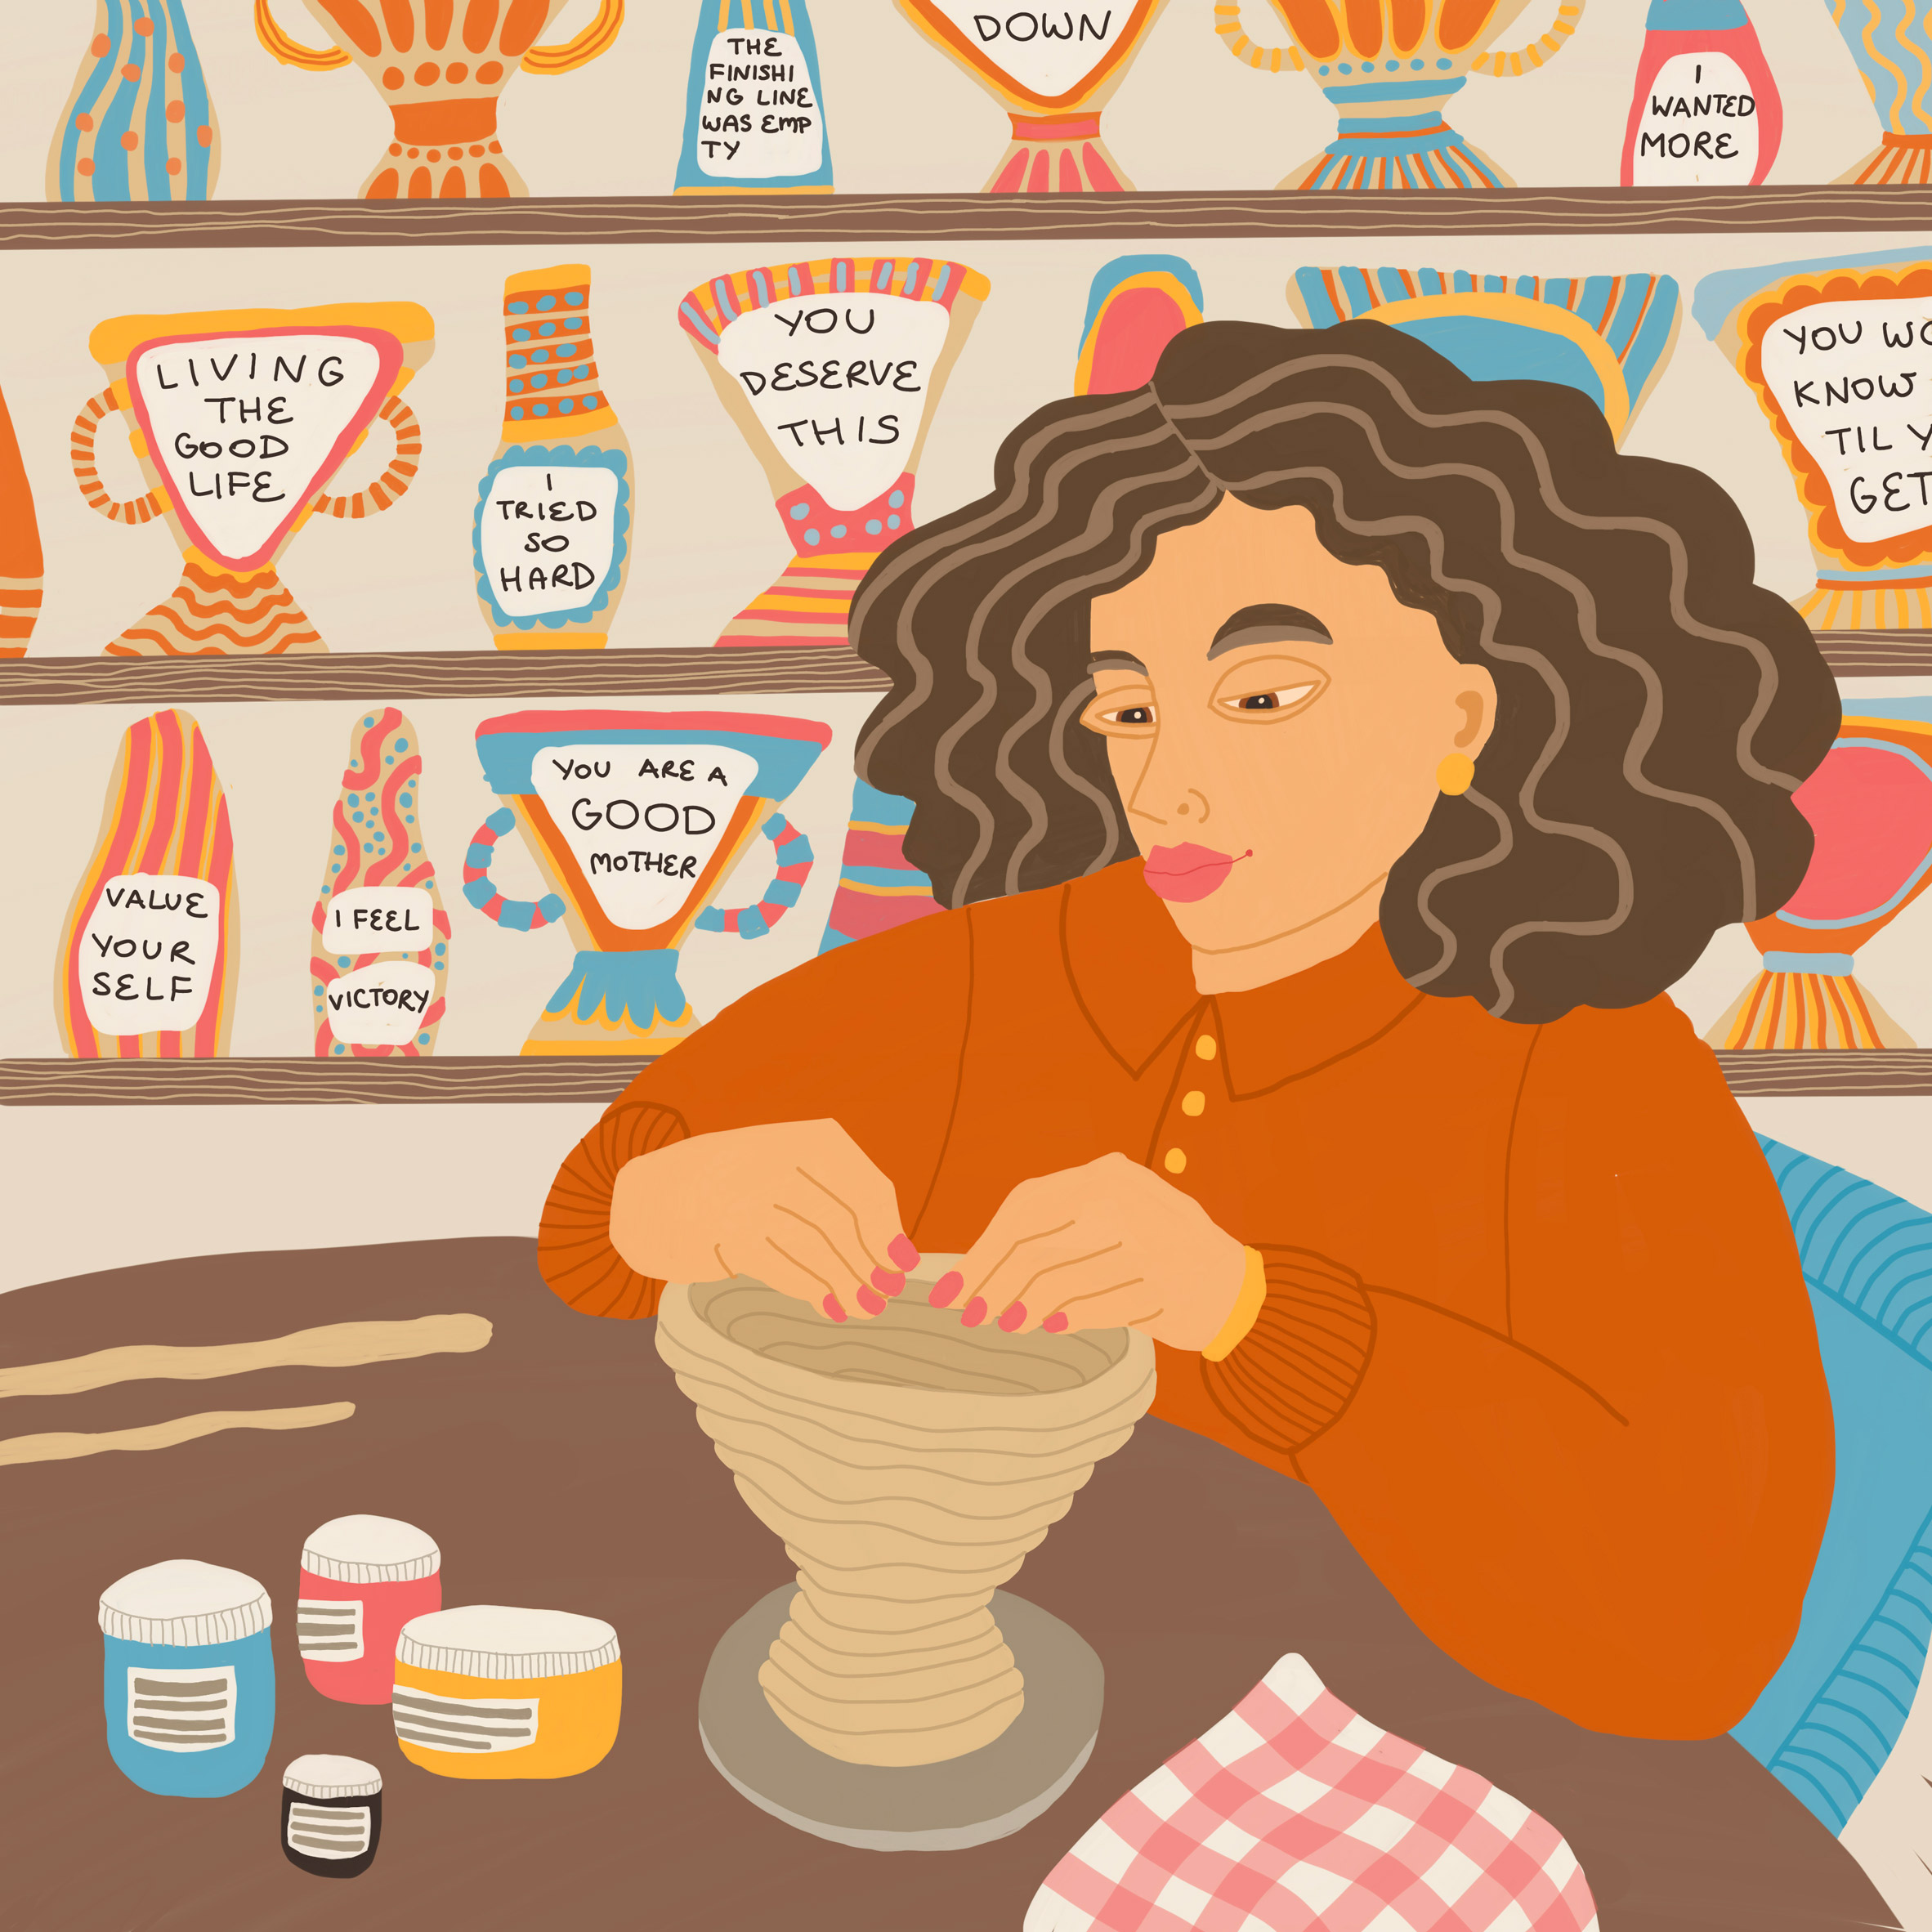 An illustration of someone making ceramics